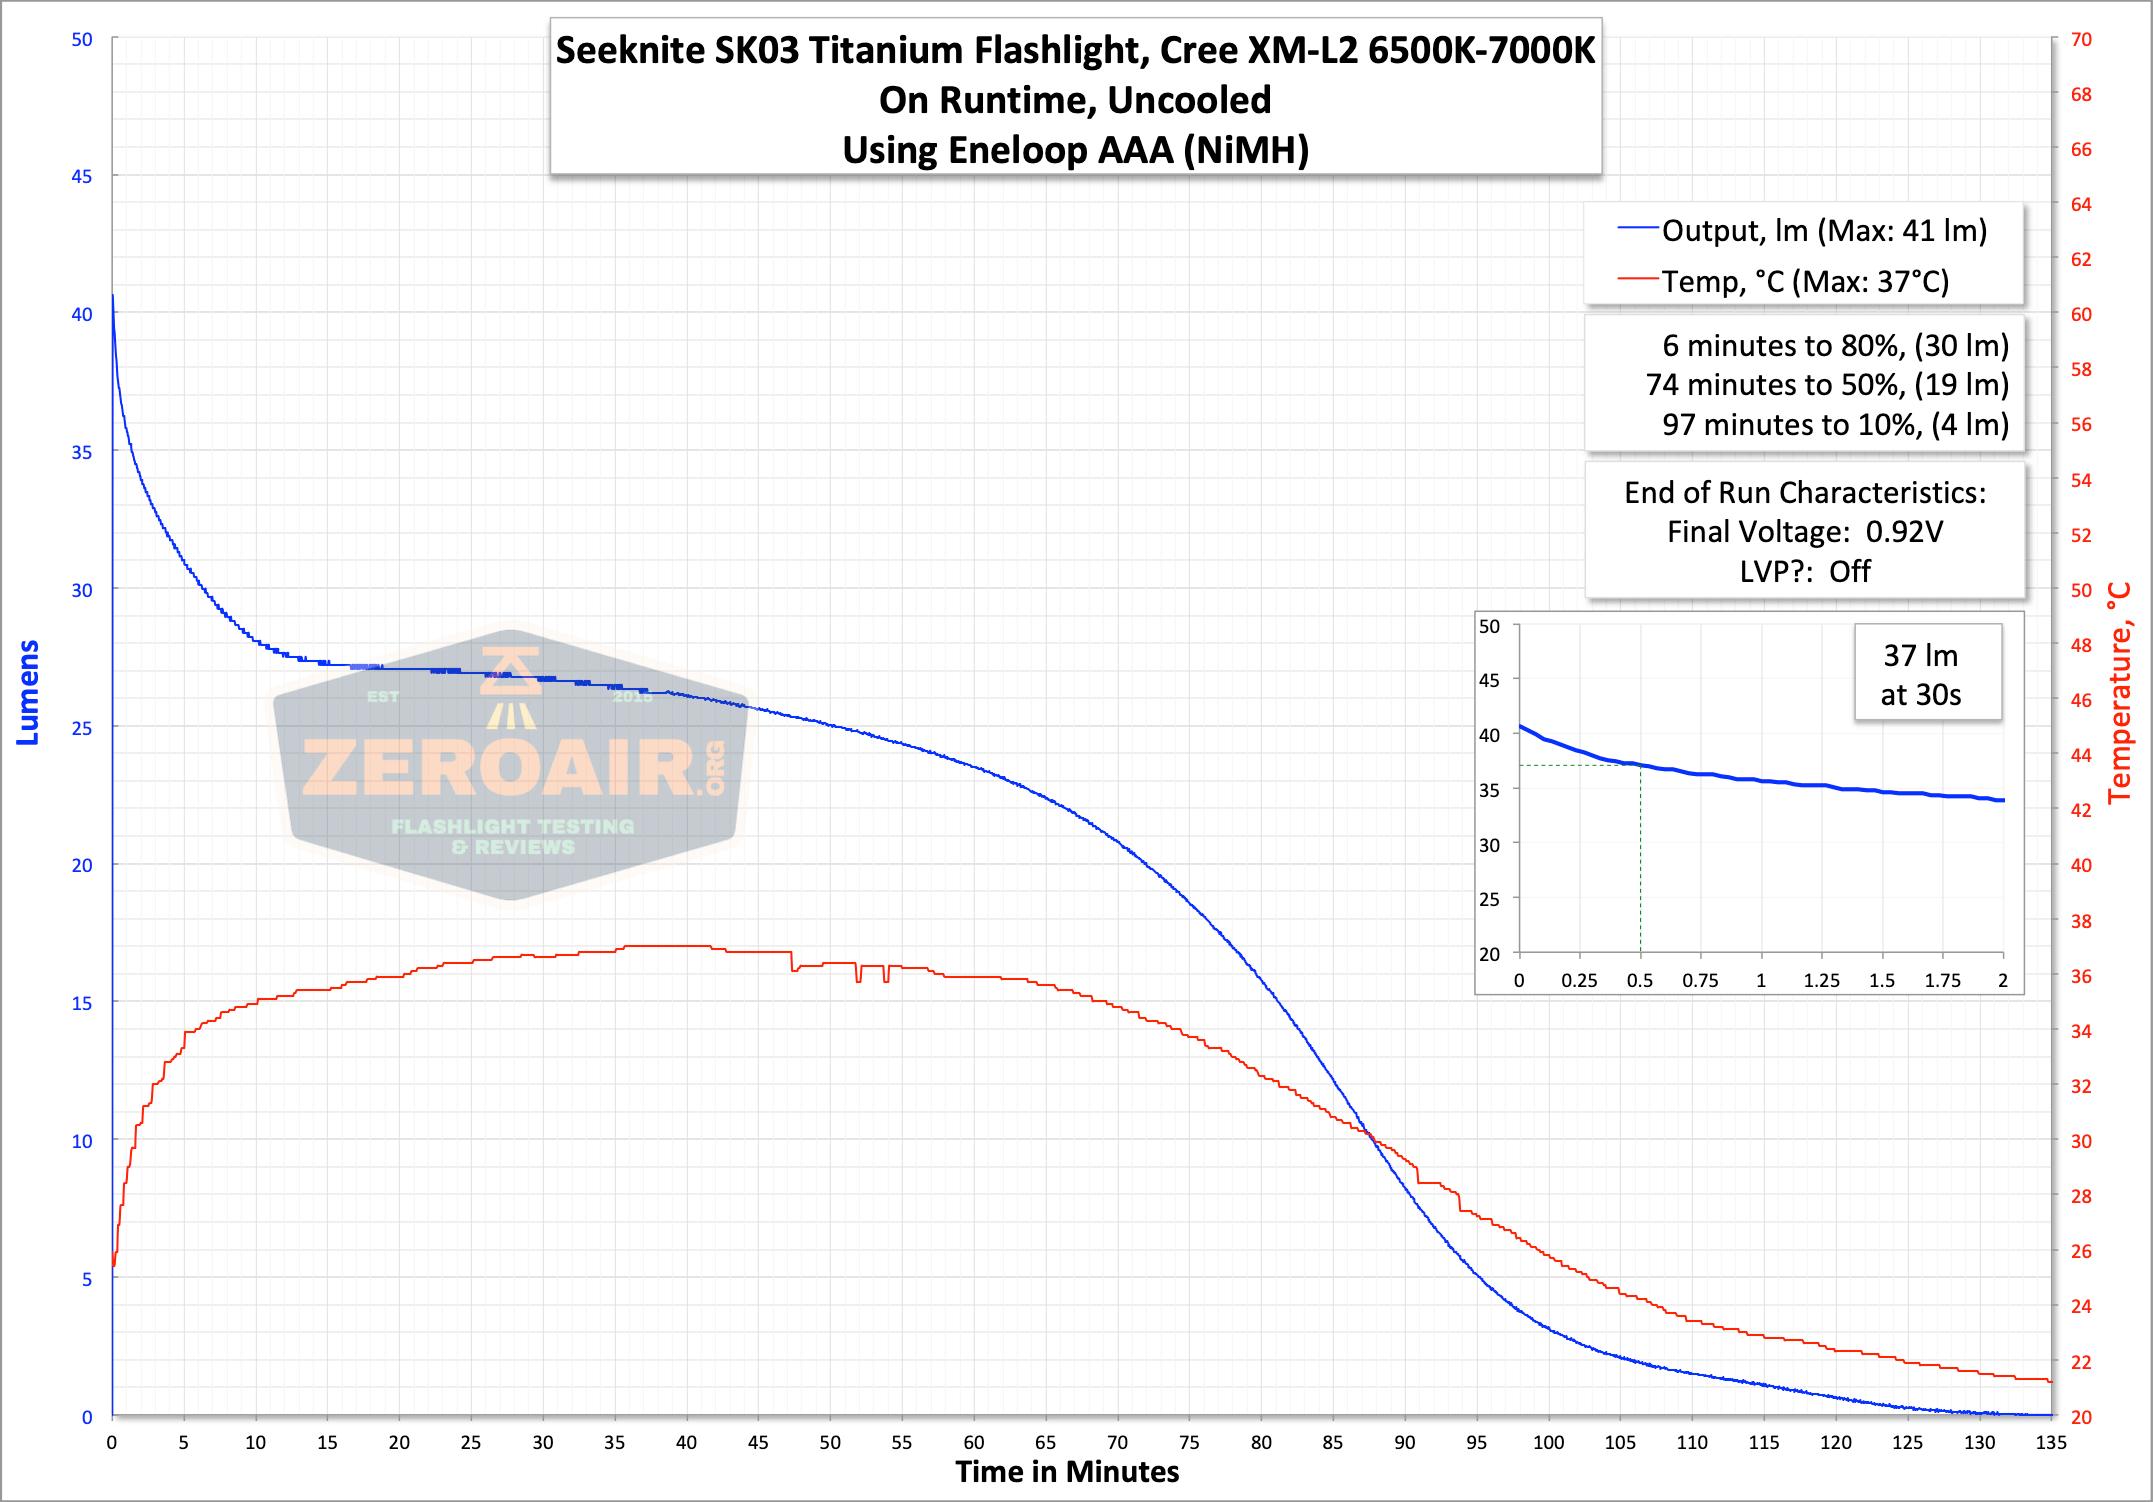 Seeknite SK03 runtime graph